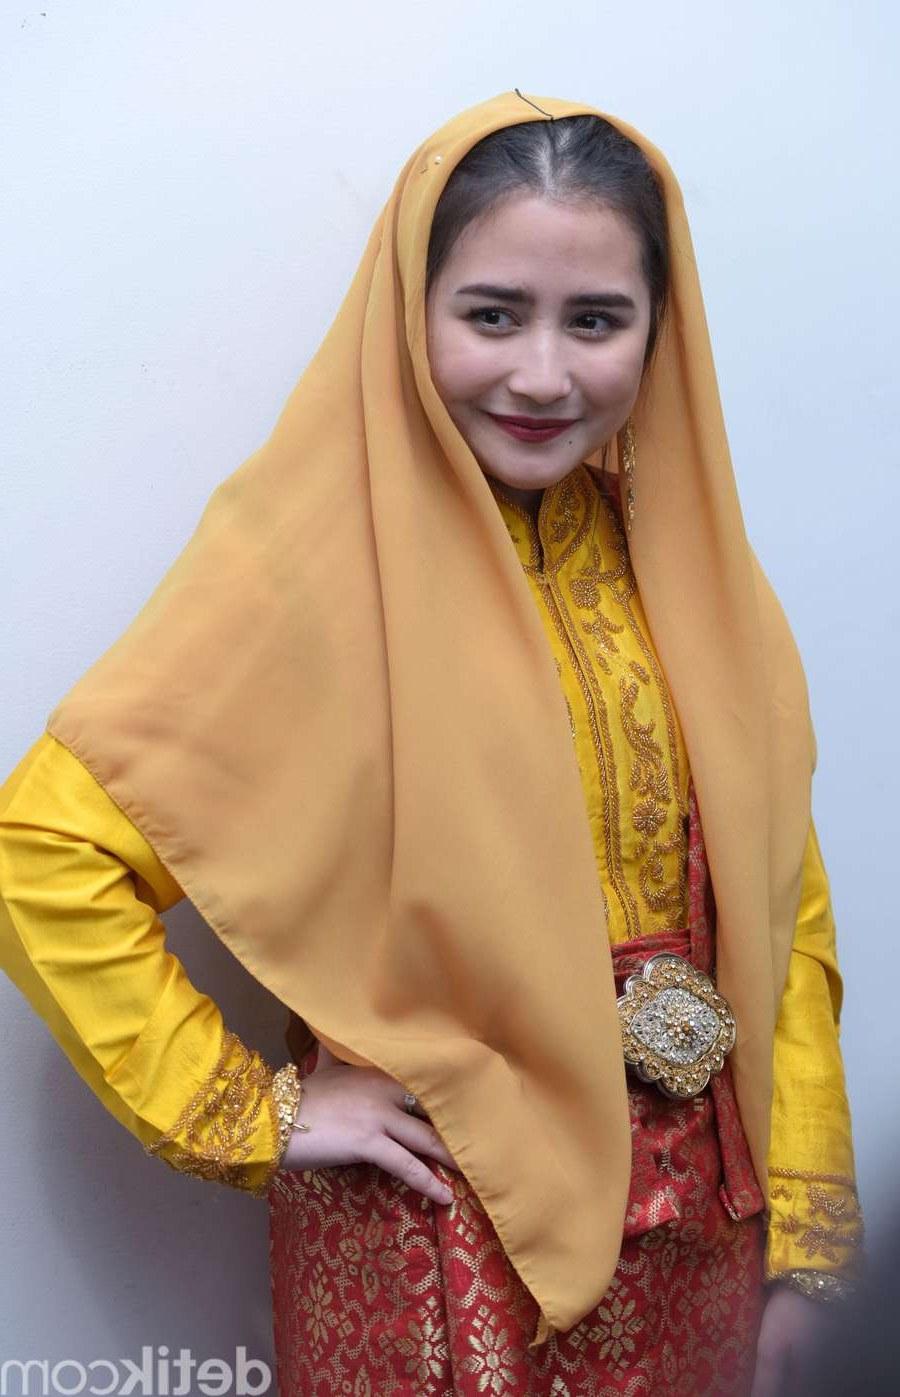 Design Baju Lebaran Prilly Latuconsina Xtd6 Pesona Prilly Latuconsina Saat Mengenakan Baju Adat Aceh